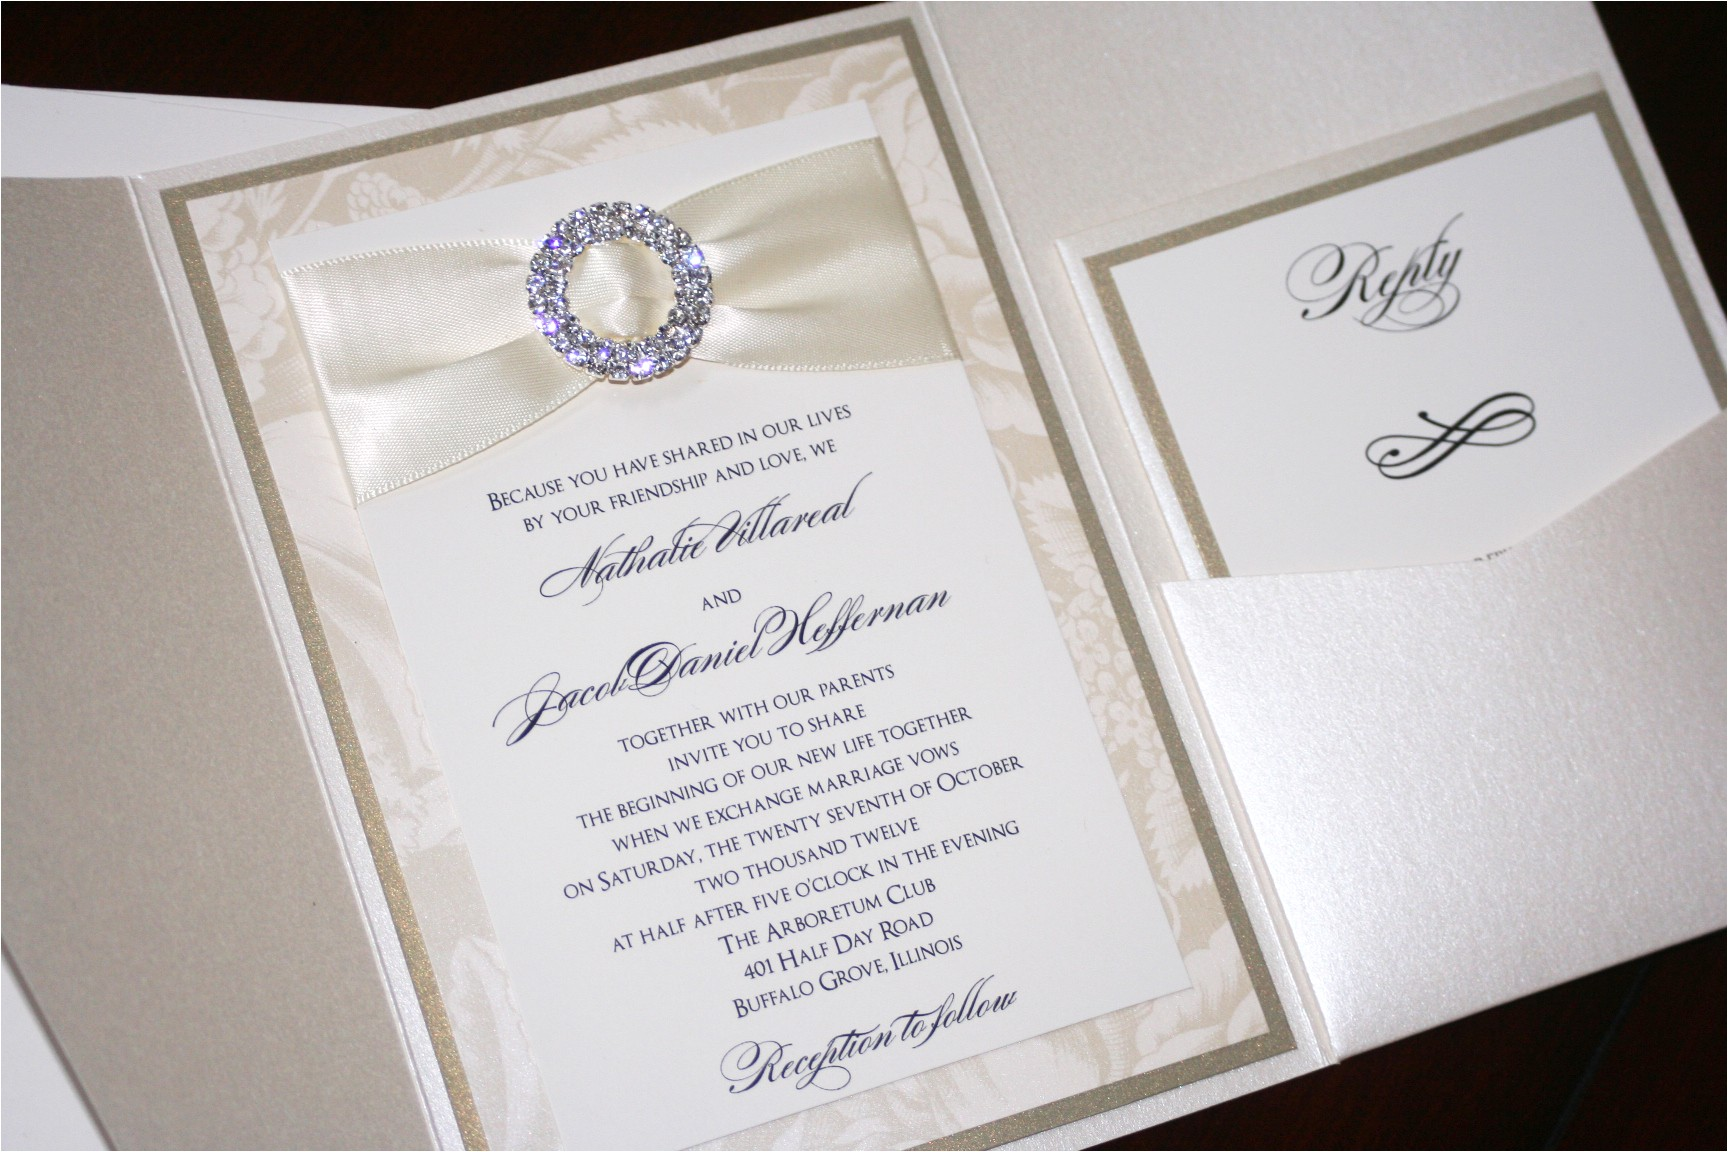 Wedding Invitations at Walmart Make Your Own Wedding Invitations Walmart Modern Designs